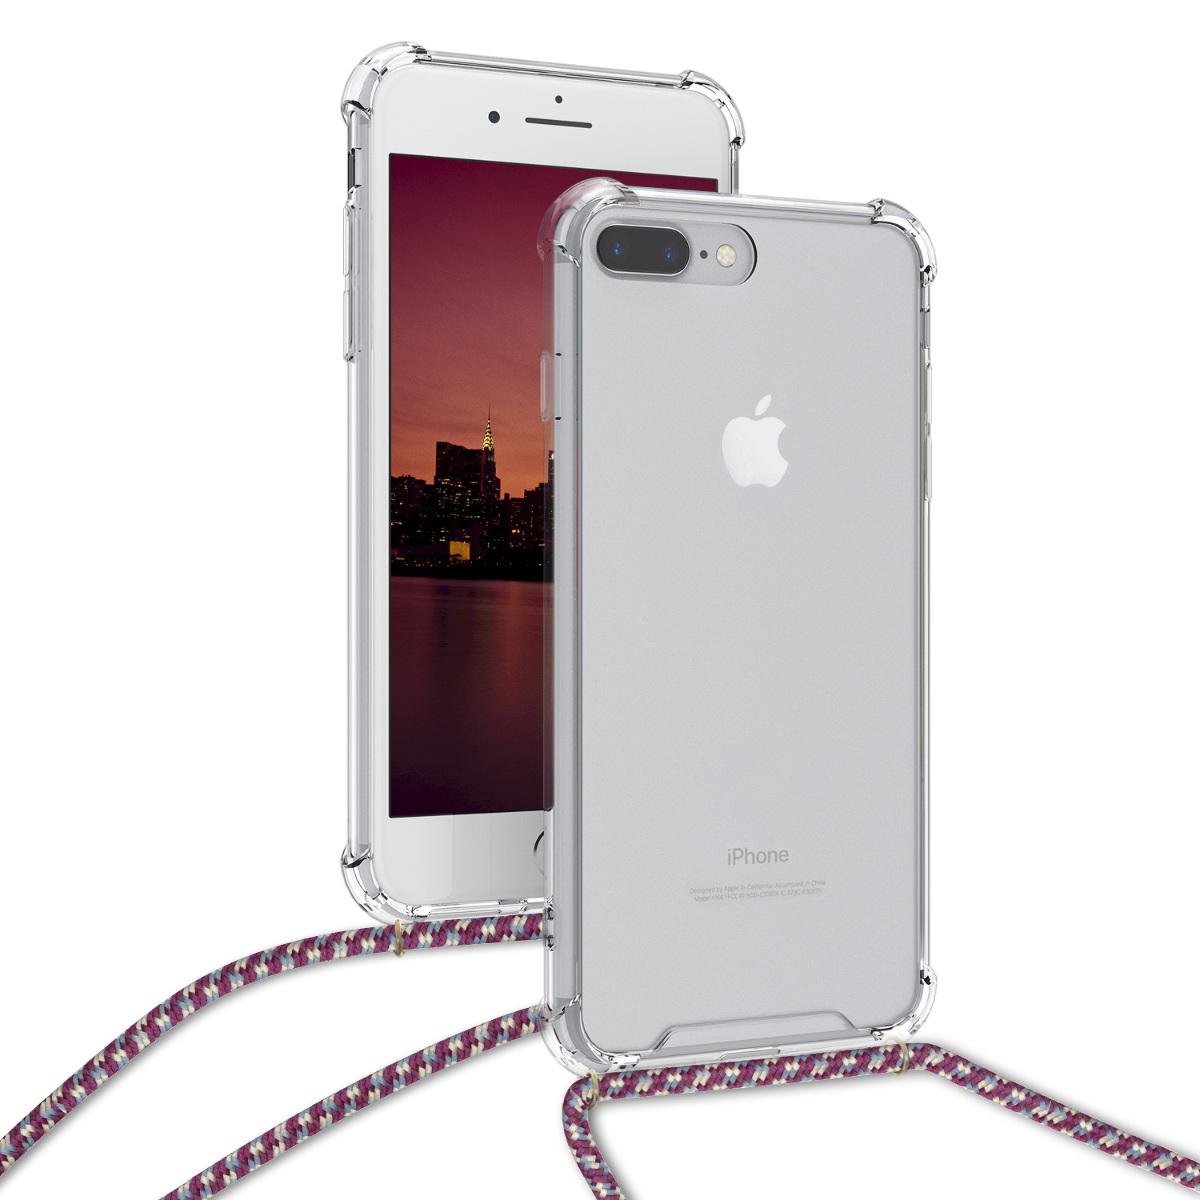 KW Θήκη Σιλικόνης με Λουράκι Apple iPhone 7 Plus / 8 Plus - Transparent (48204.38)